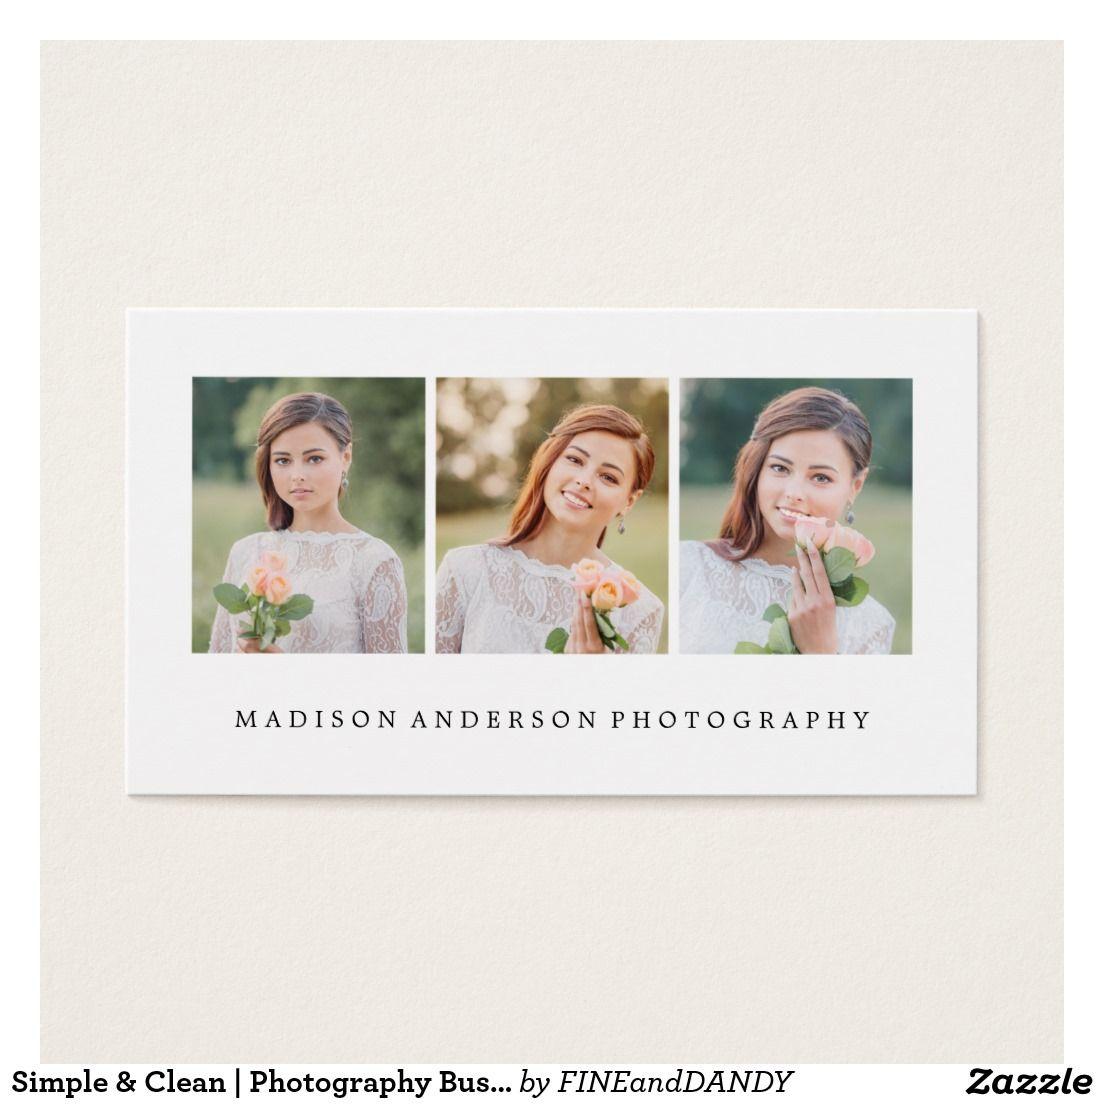 Einfache u. saubere   Fotografie-Visitenkarten Visitenkarte